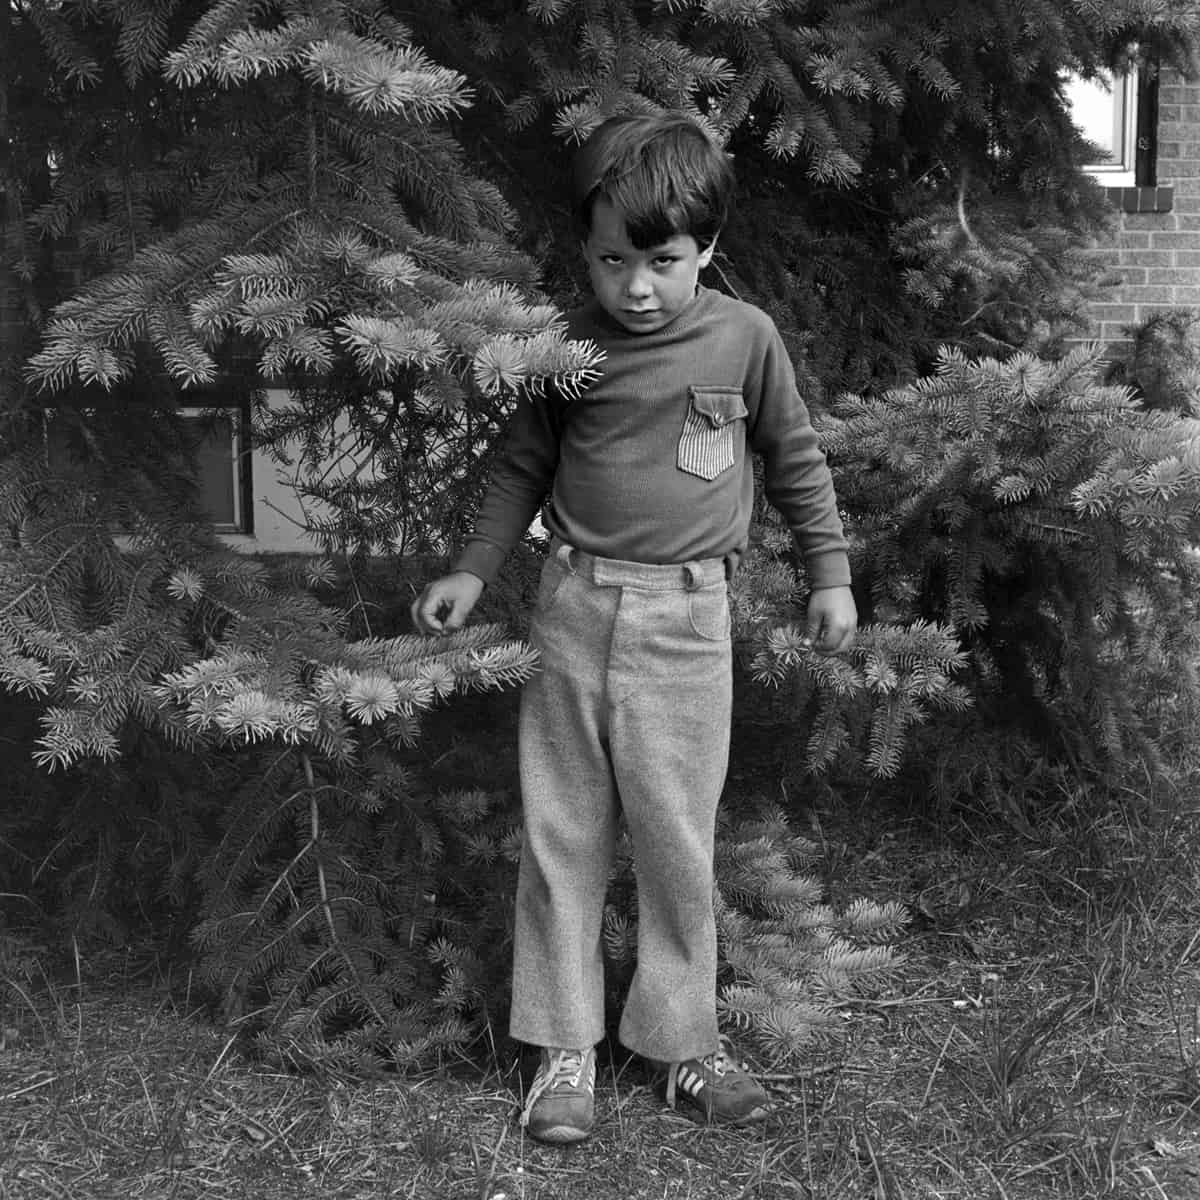 Julian, Denver, 1978 Photographie ©Ricardo Bloch